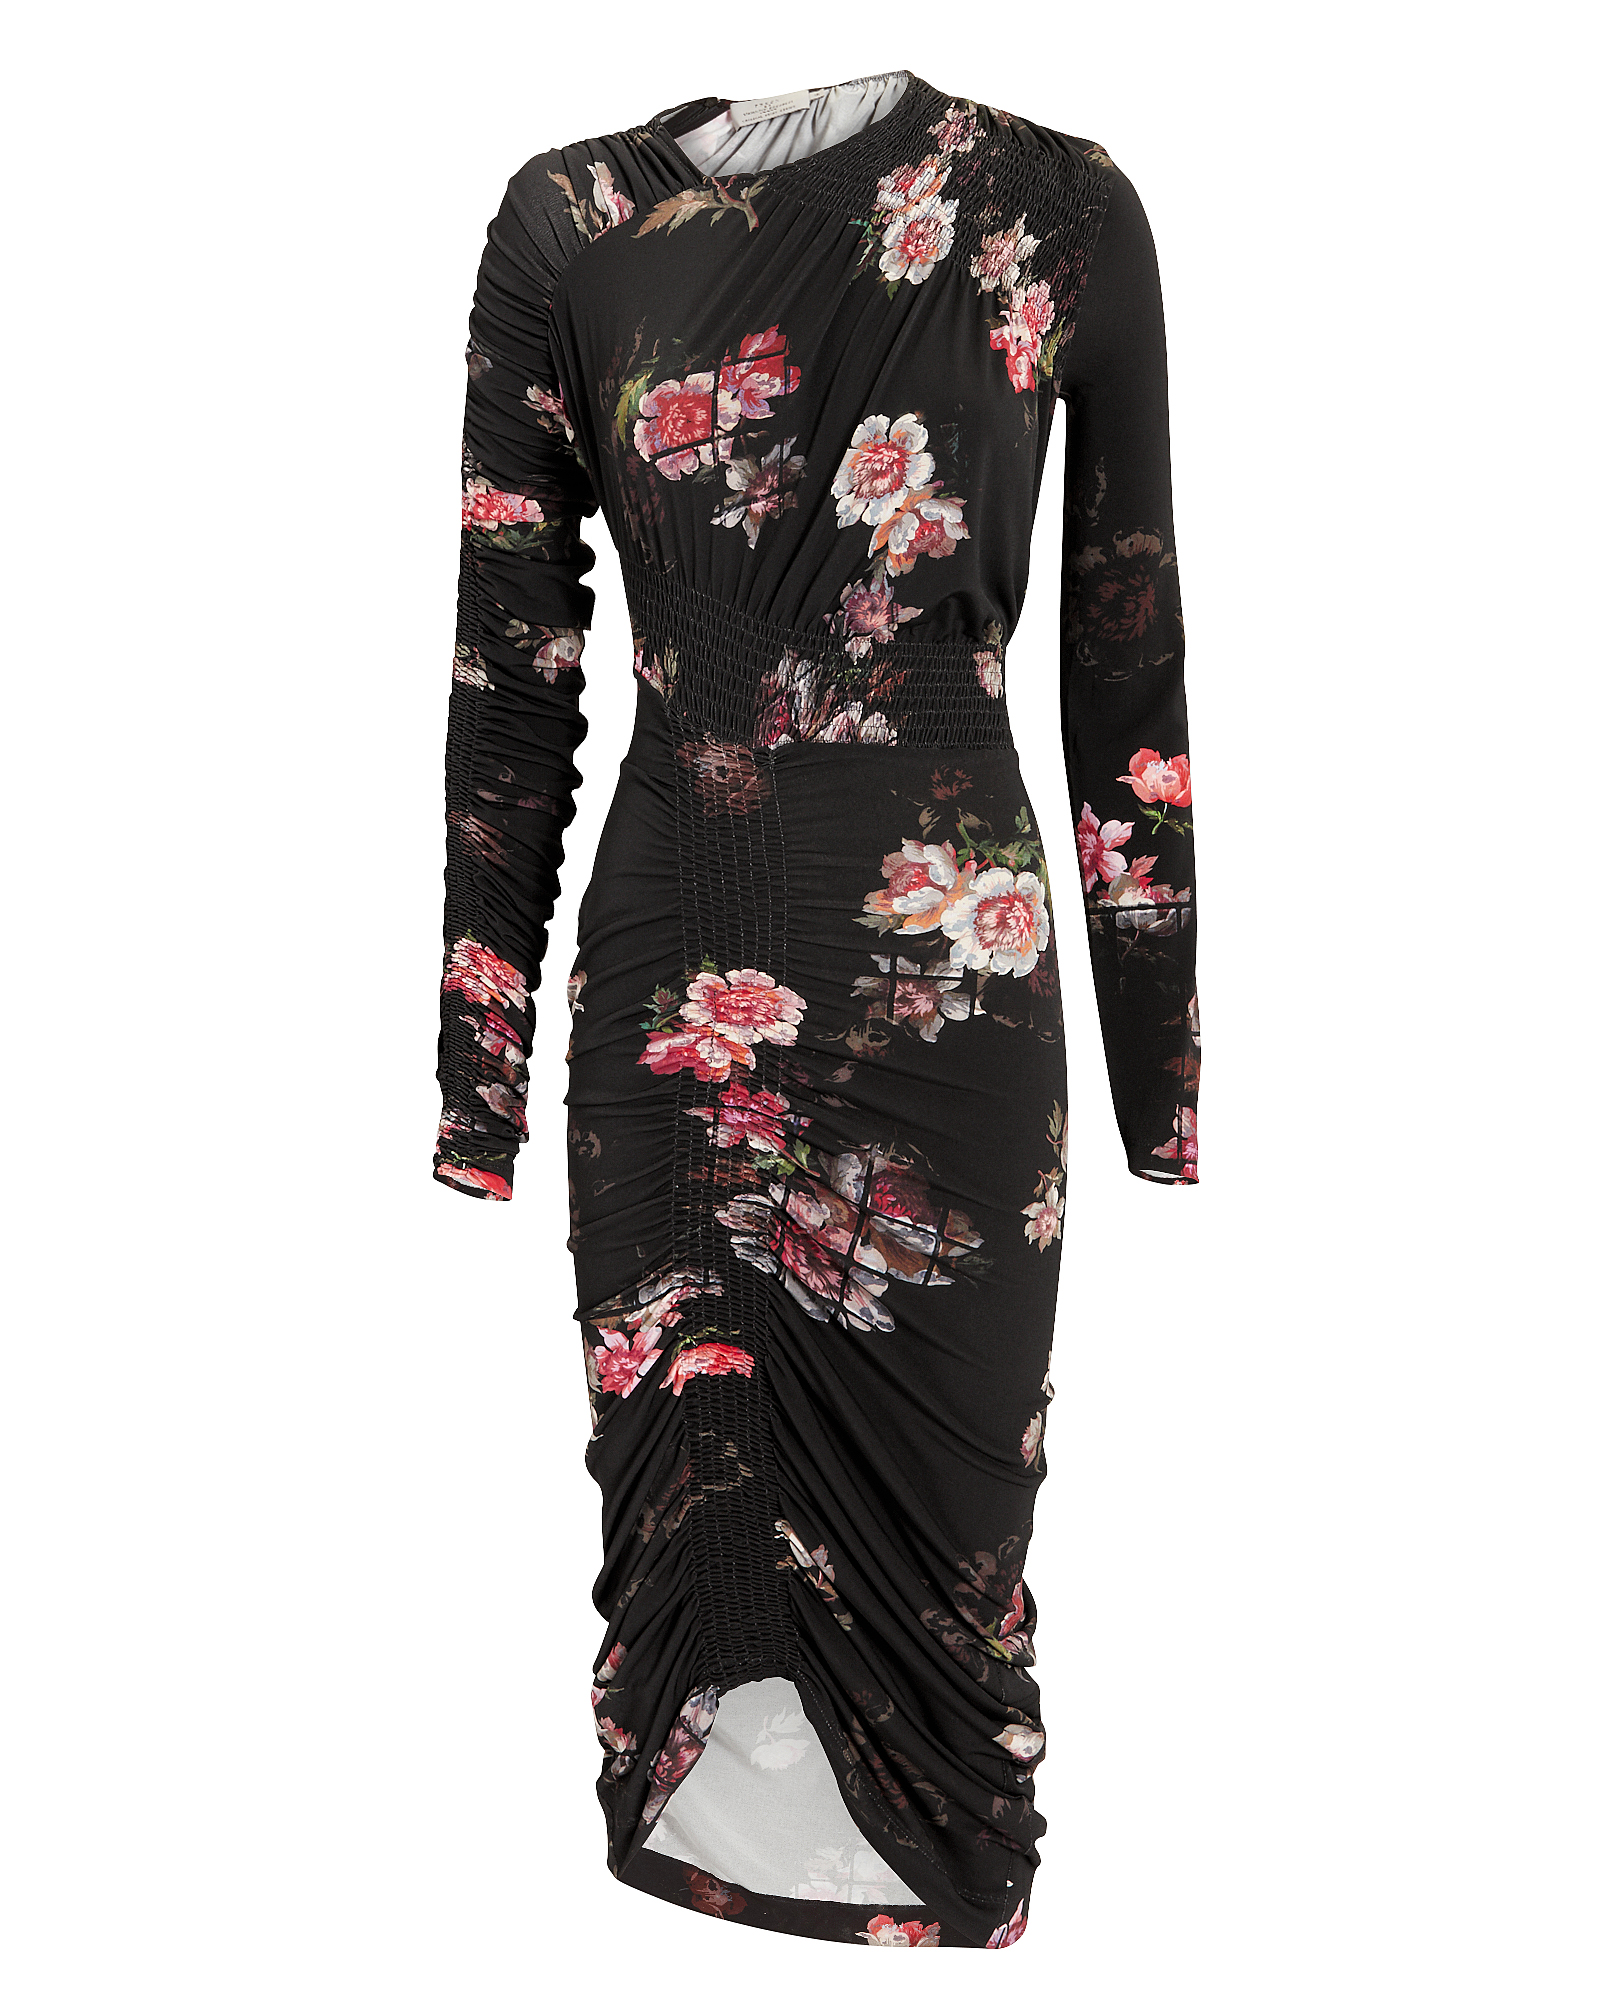 PREEN BY THORNTON BREGAZZI RENE FLORAL RUCHED DRESS BLACK